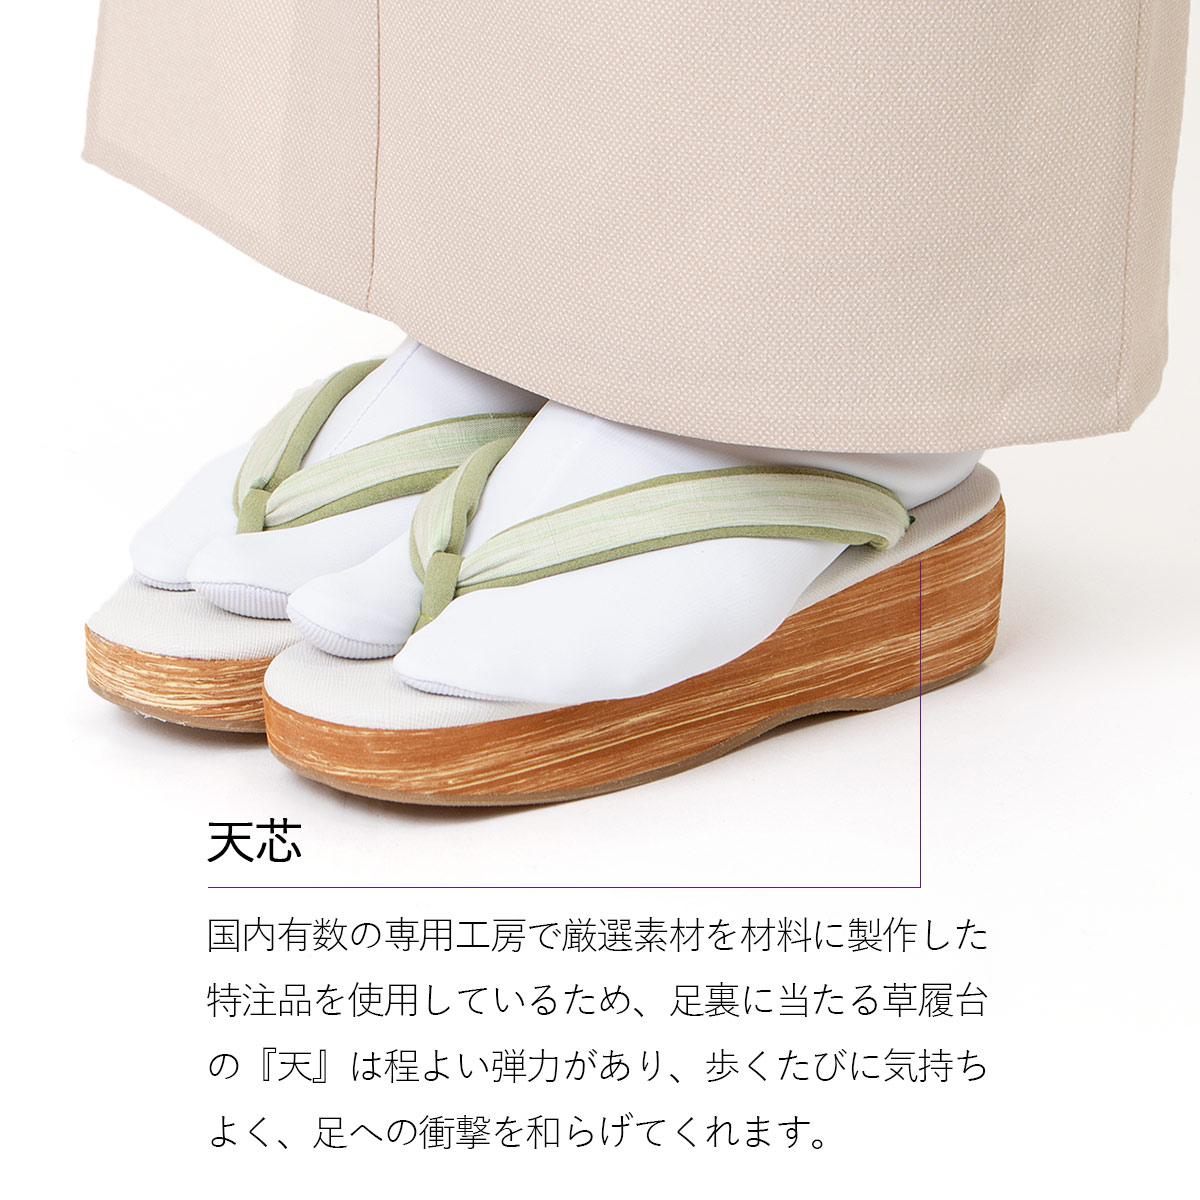 . HAKU 草履 NO.141 |ホワイト×ブルー